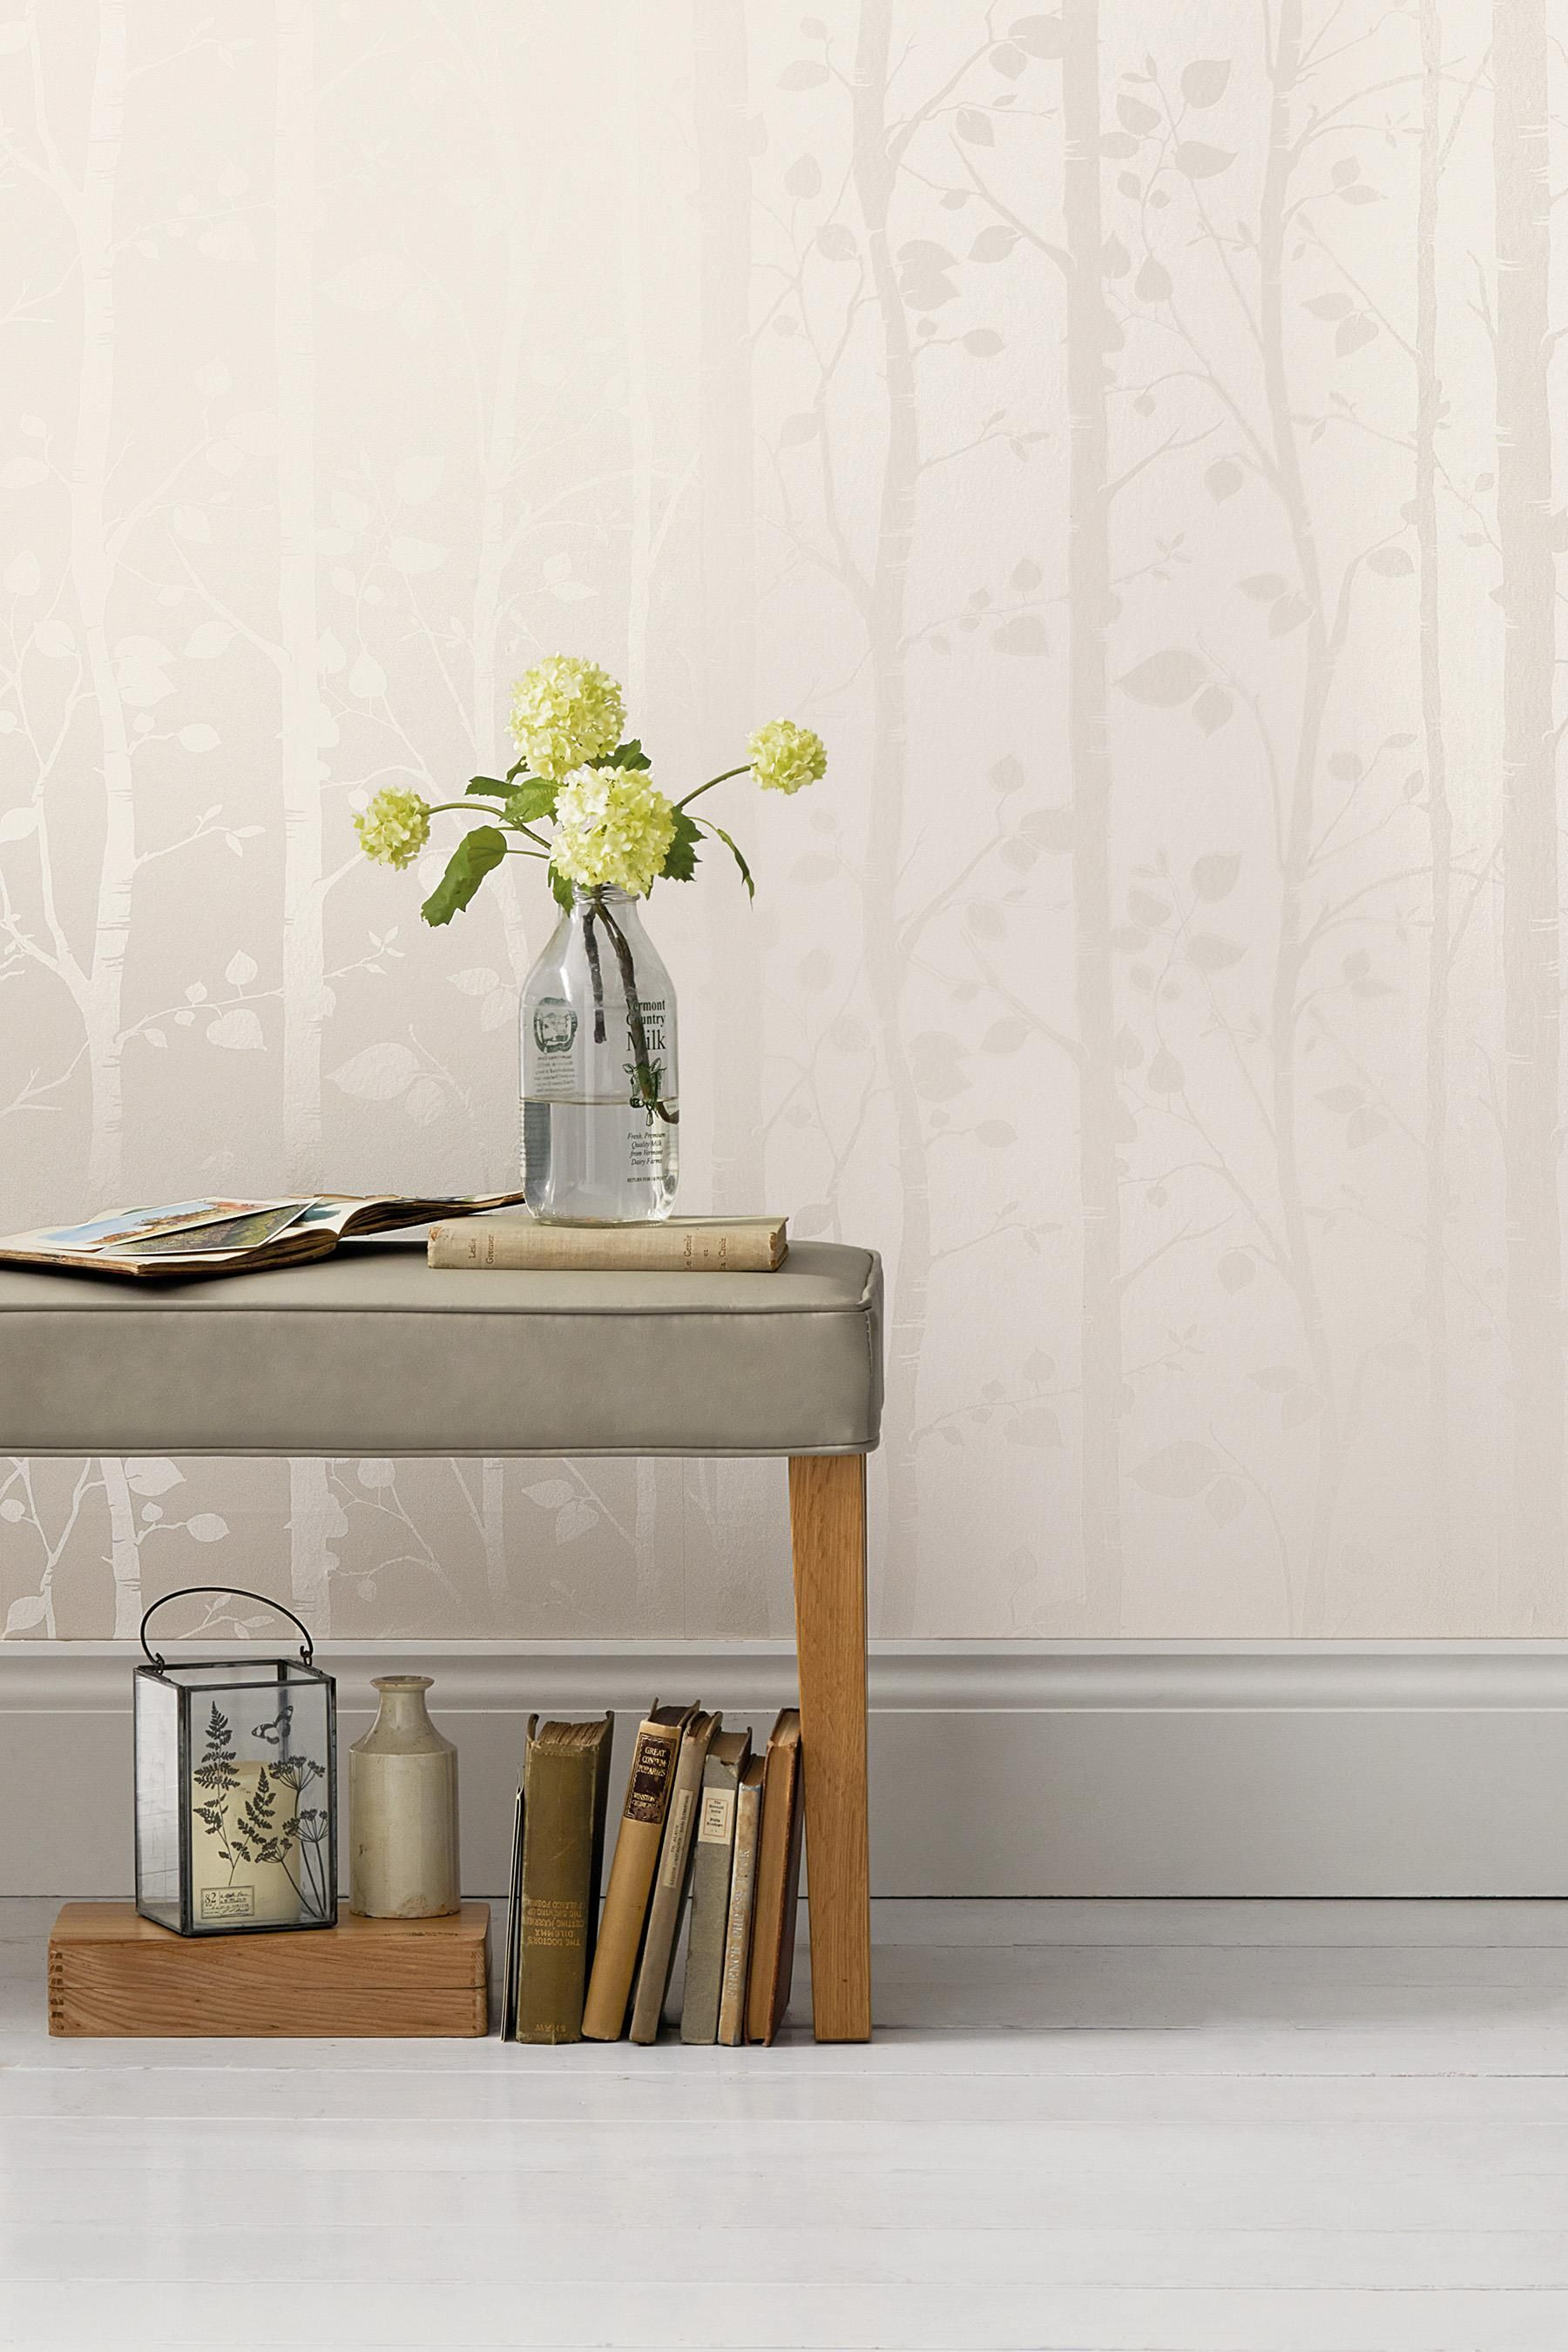 Tree Design Wallpaper Living Room: Buy Natural Trees Wallpaper From The Next UK Online Shop